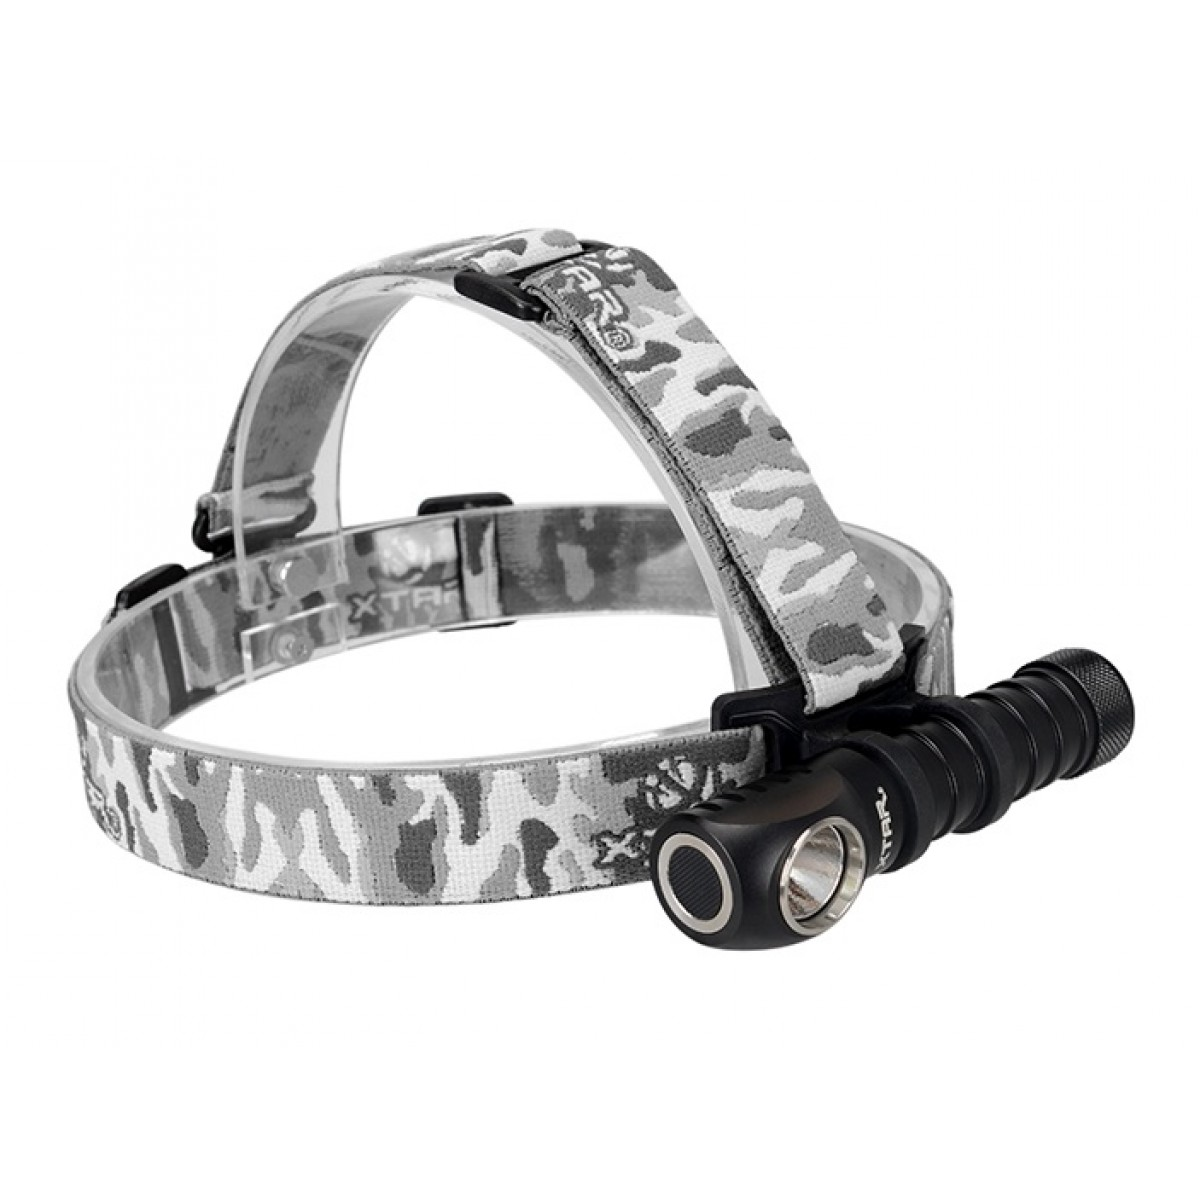 Xtar H3W Warboy Warm White CREE XM-L2 U3 LED 1000L Headlamp